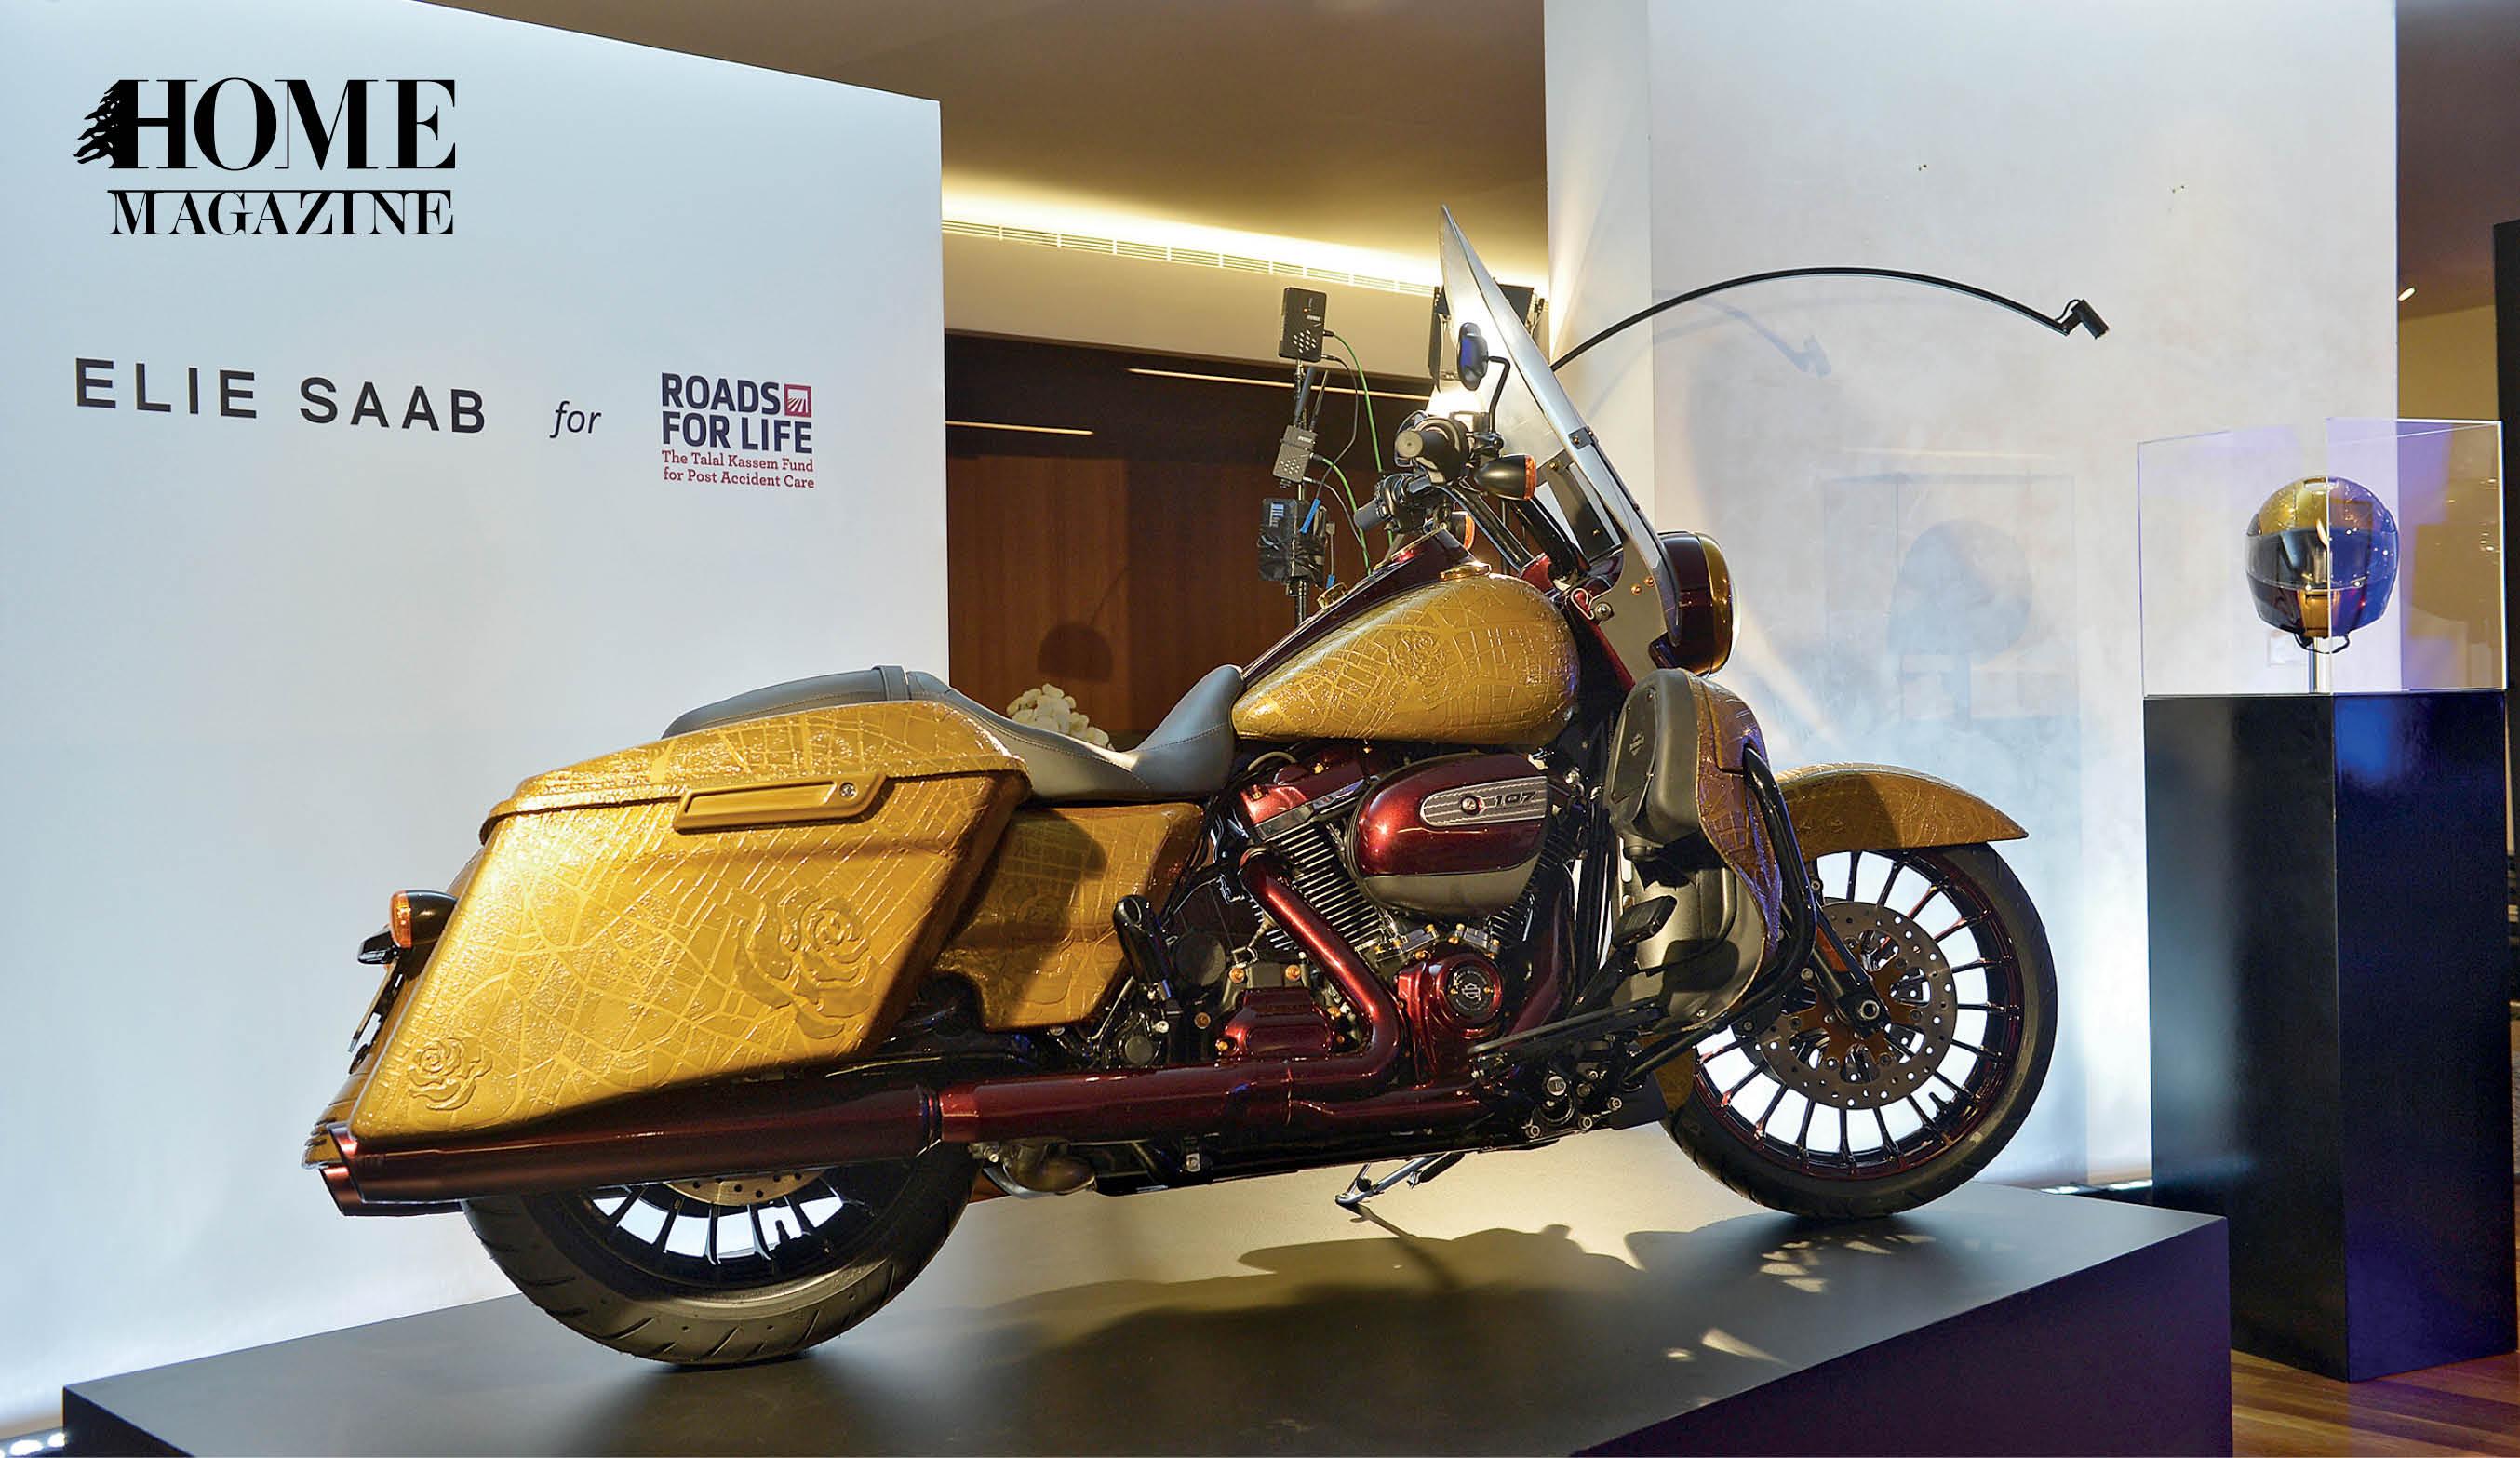 Gold colored motor bike